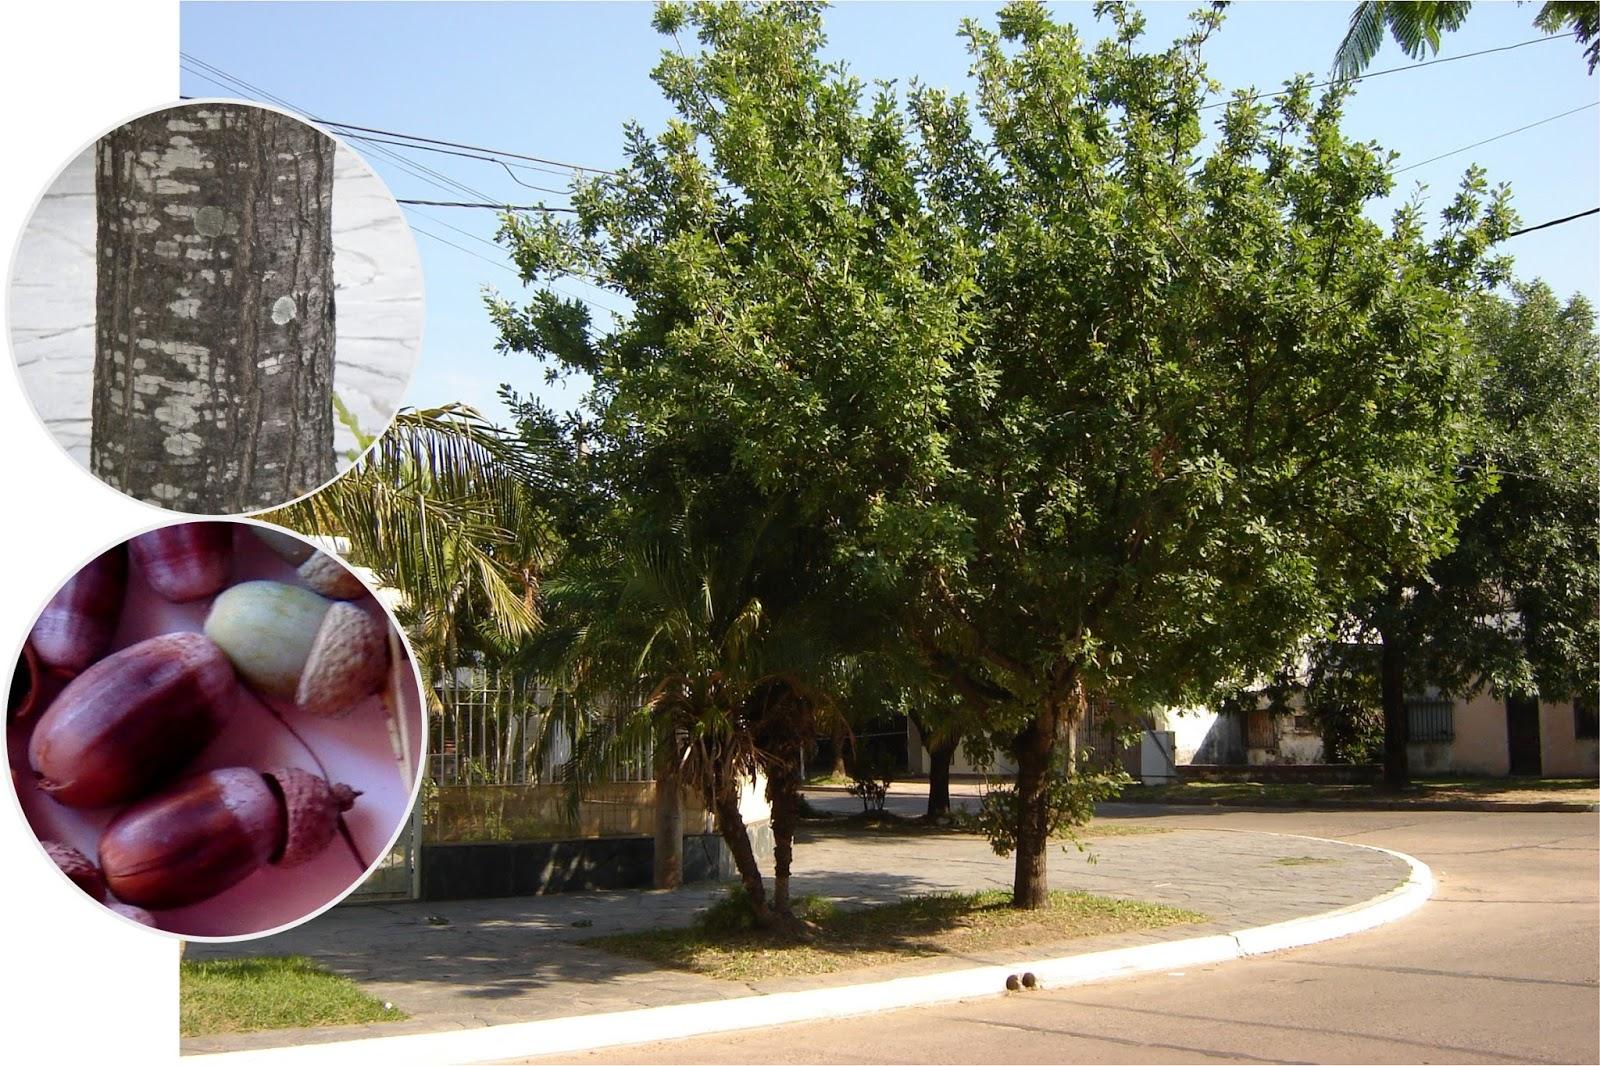 V e r d e c h a c o roble carballo for Arboles perennes en argentina